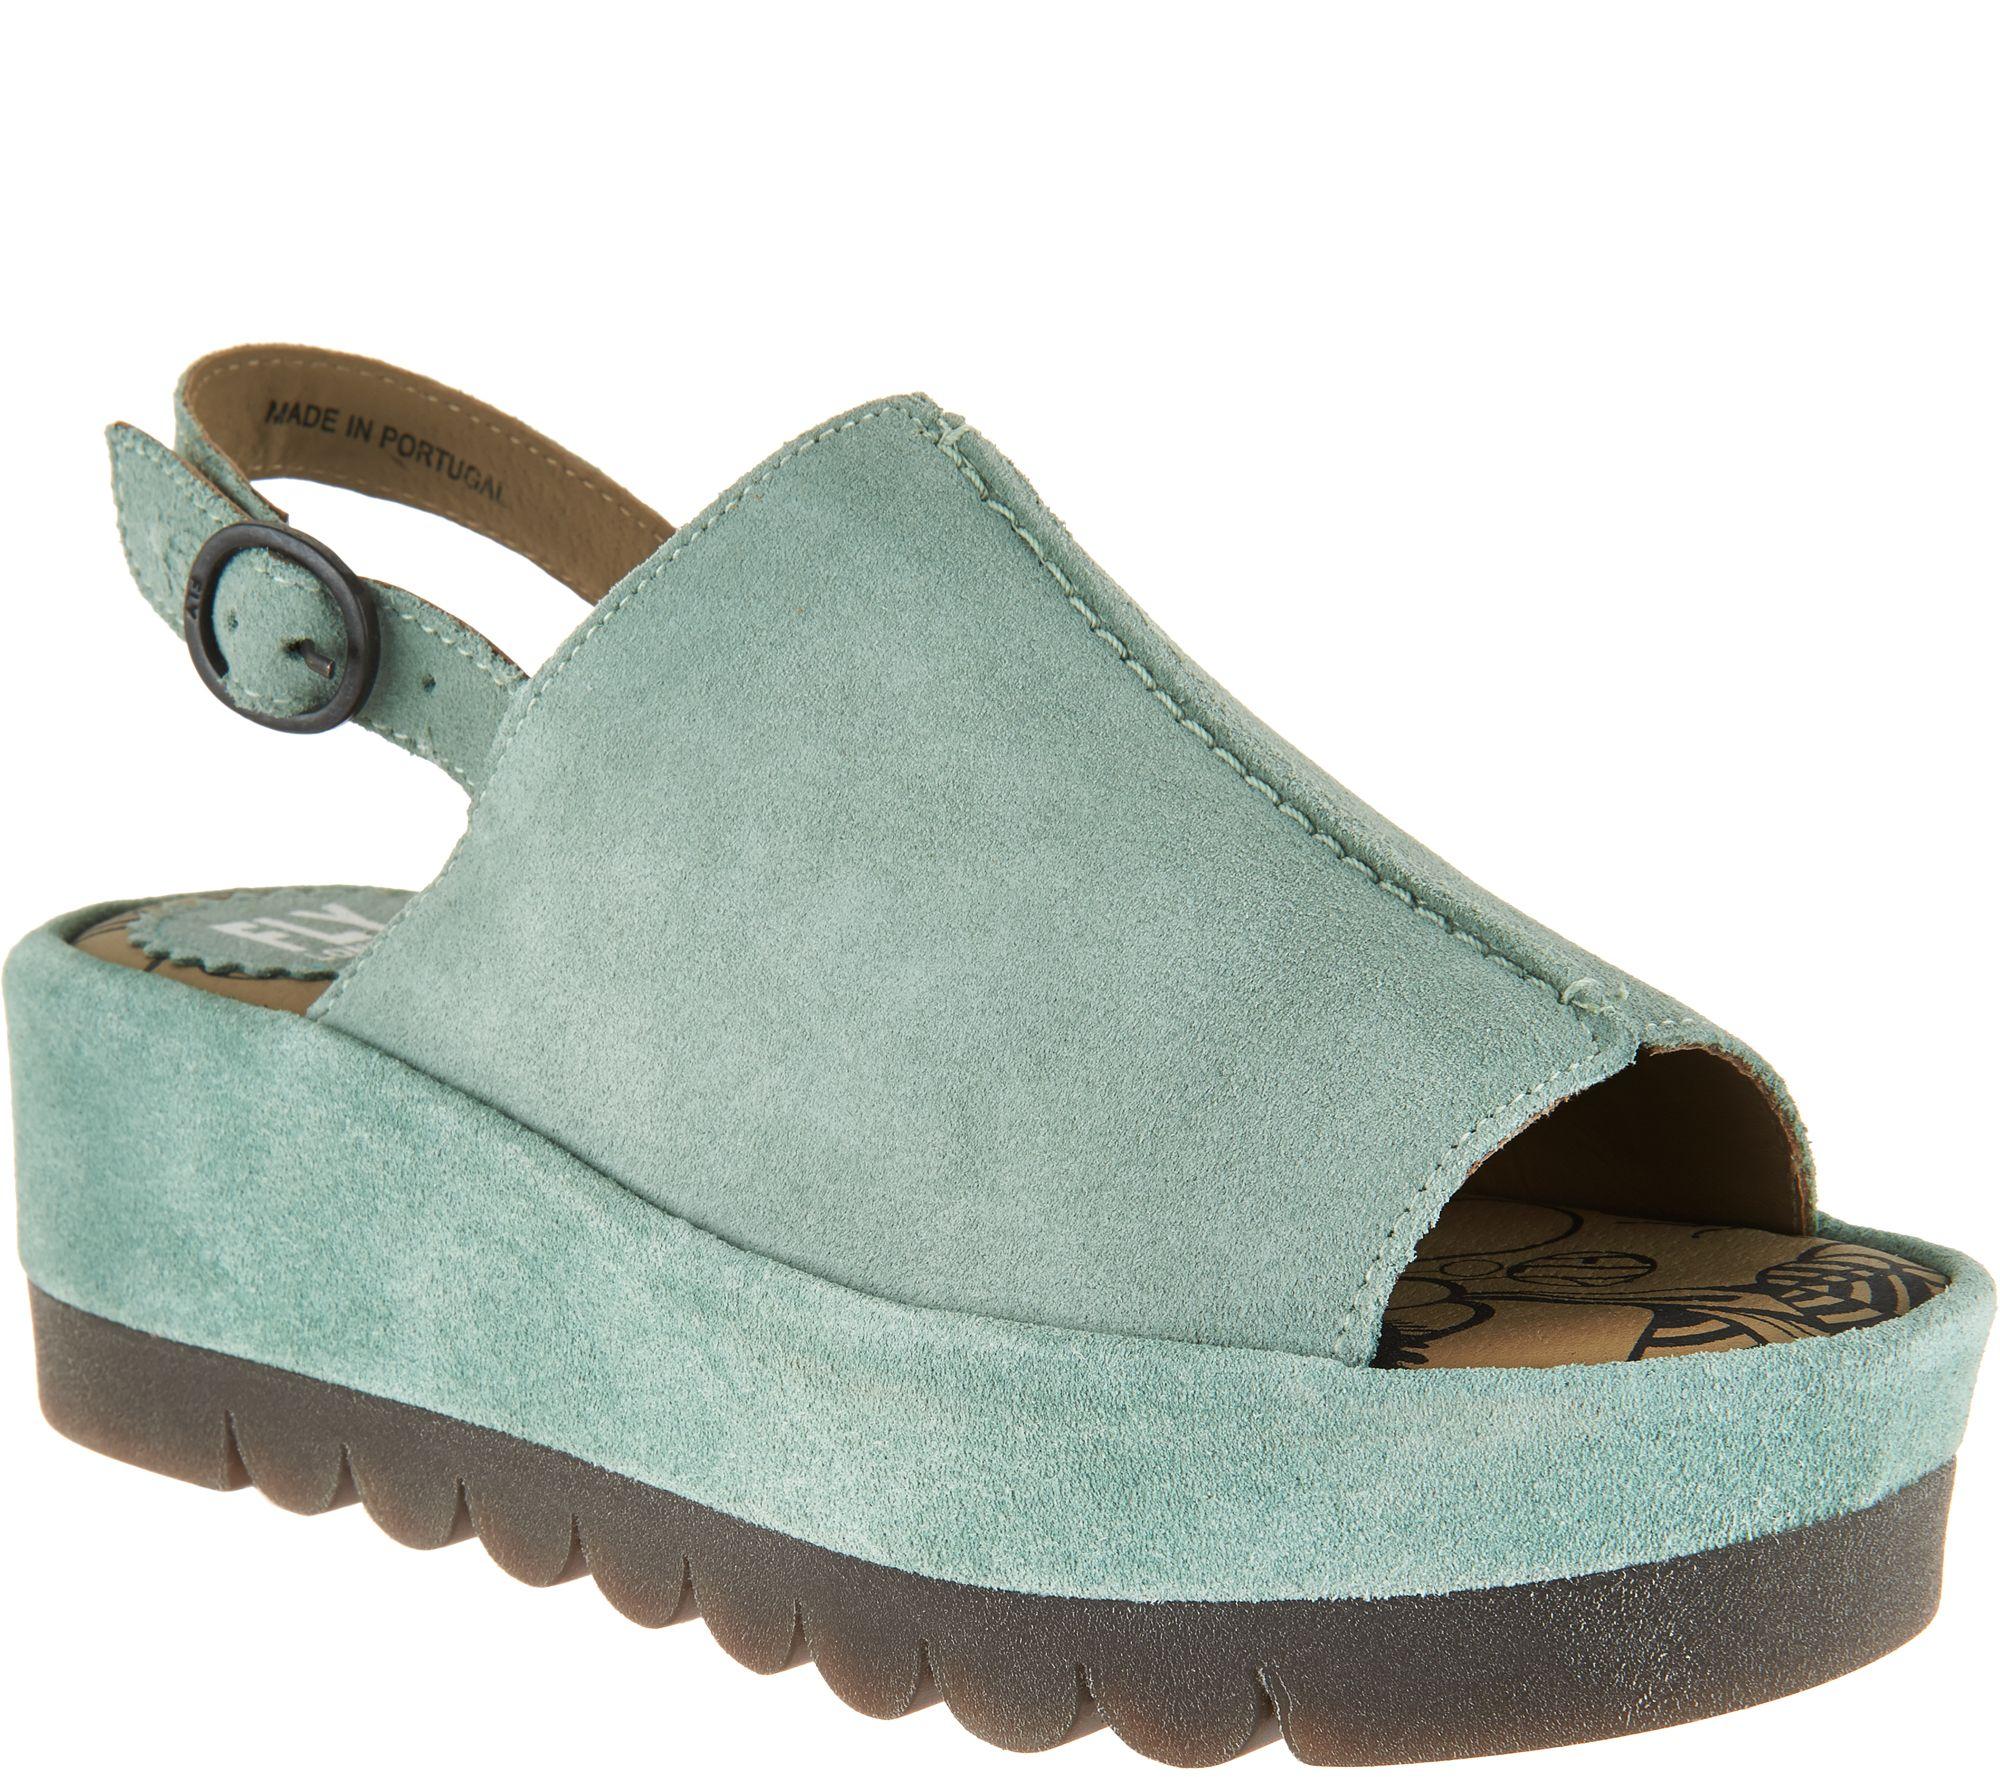 FLY London Leather Platflorm Sandals - Bora - A290447